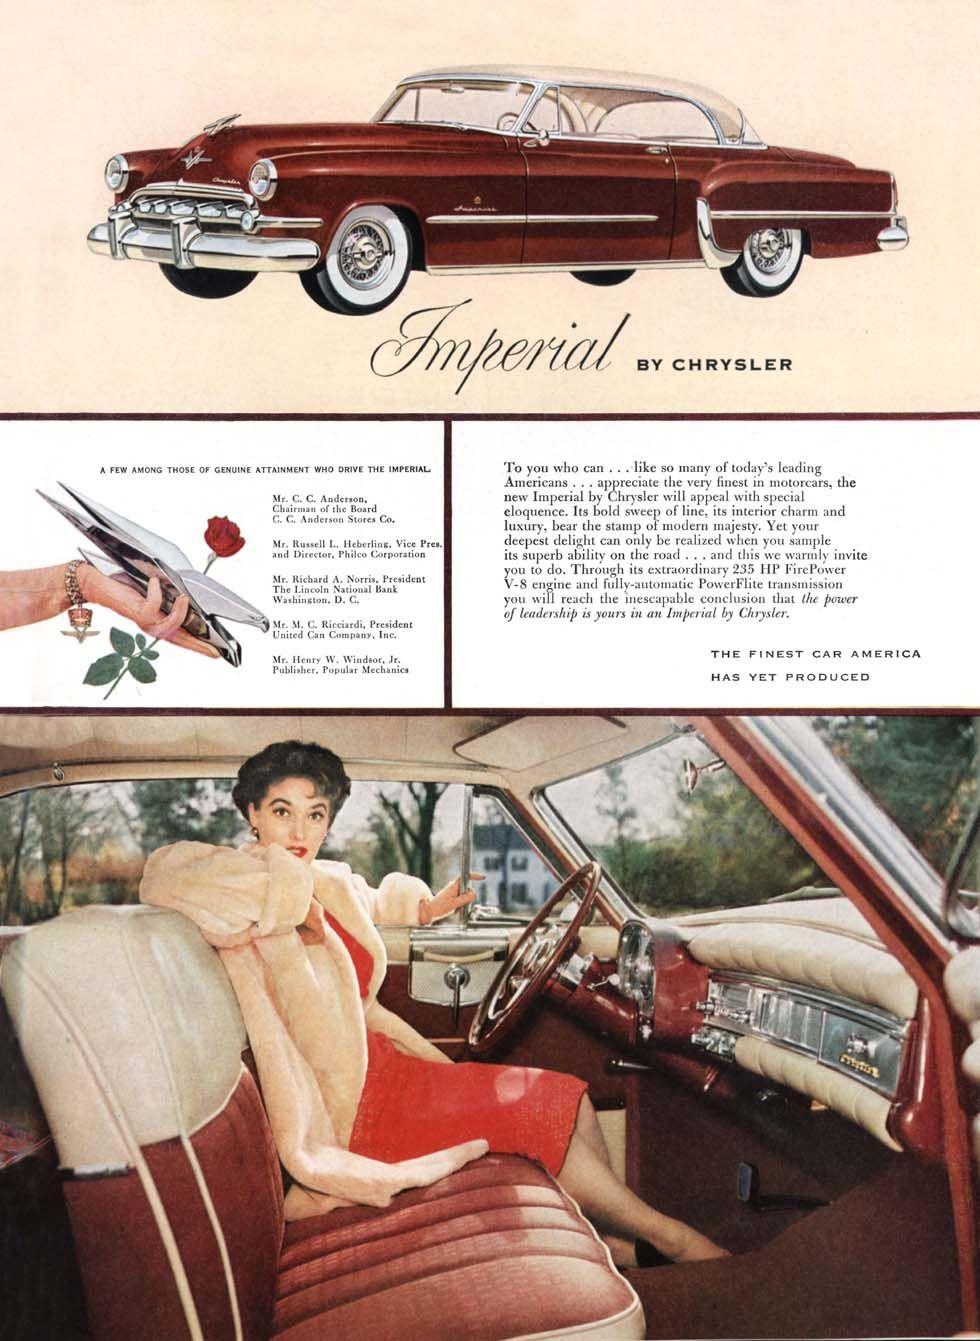 1954 chrysler imperial ad04 chrysler imperial vintage cars